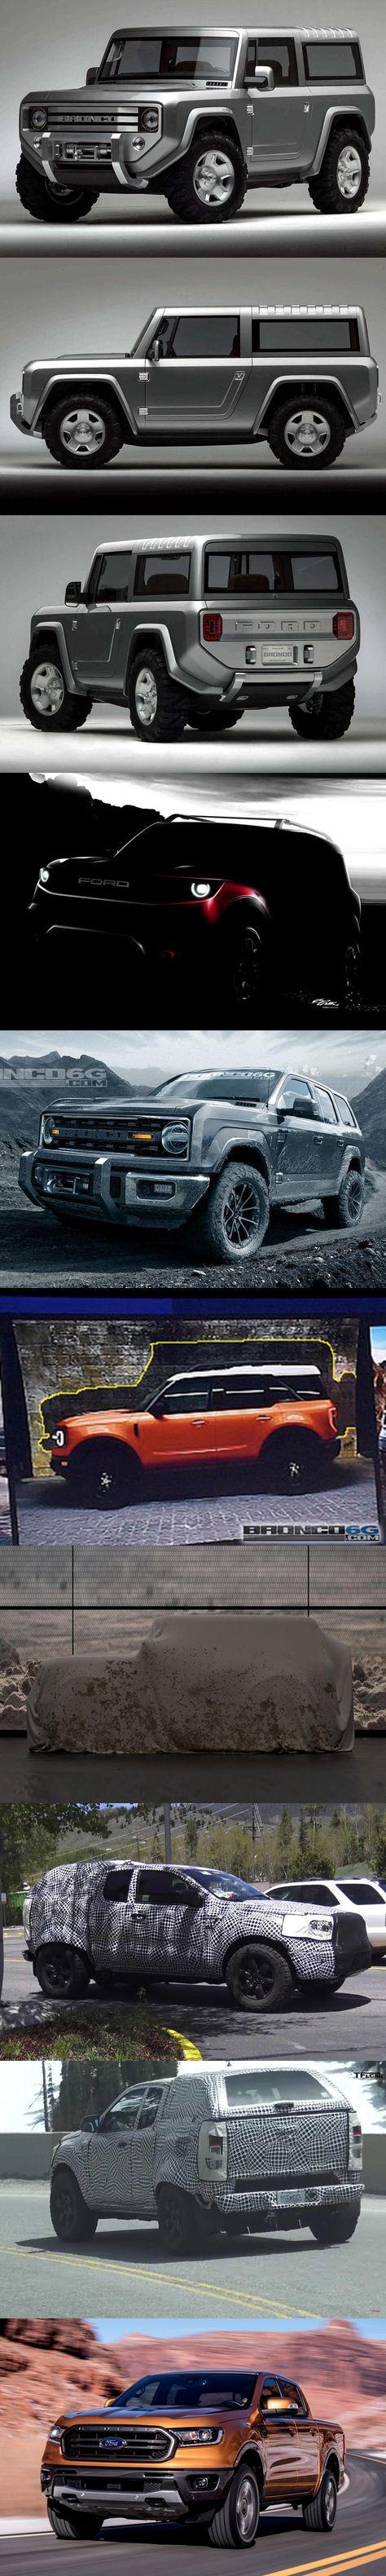 The Bronco Vs Wrangler Showdown Is Coming Soon Ford Bronco